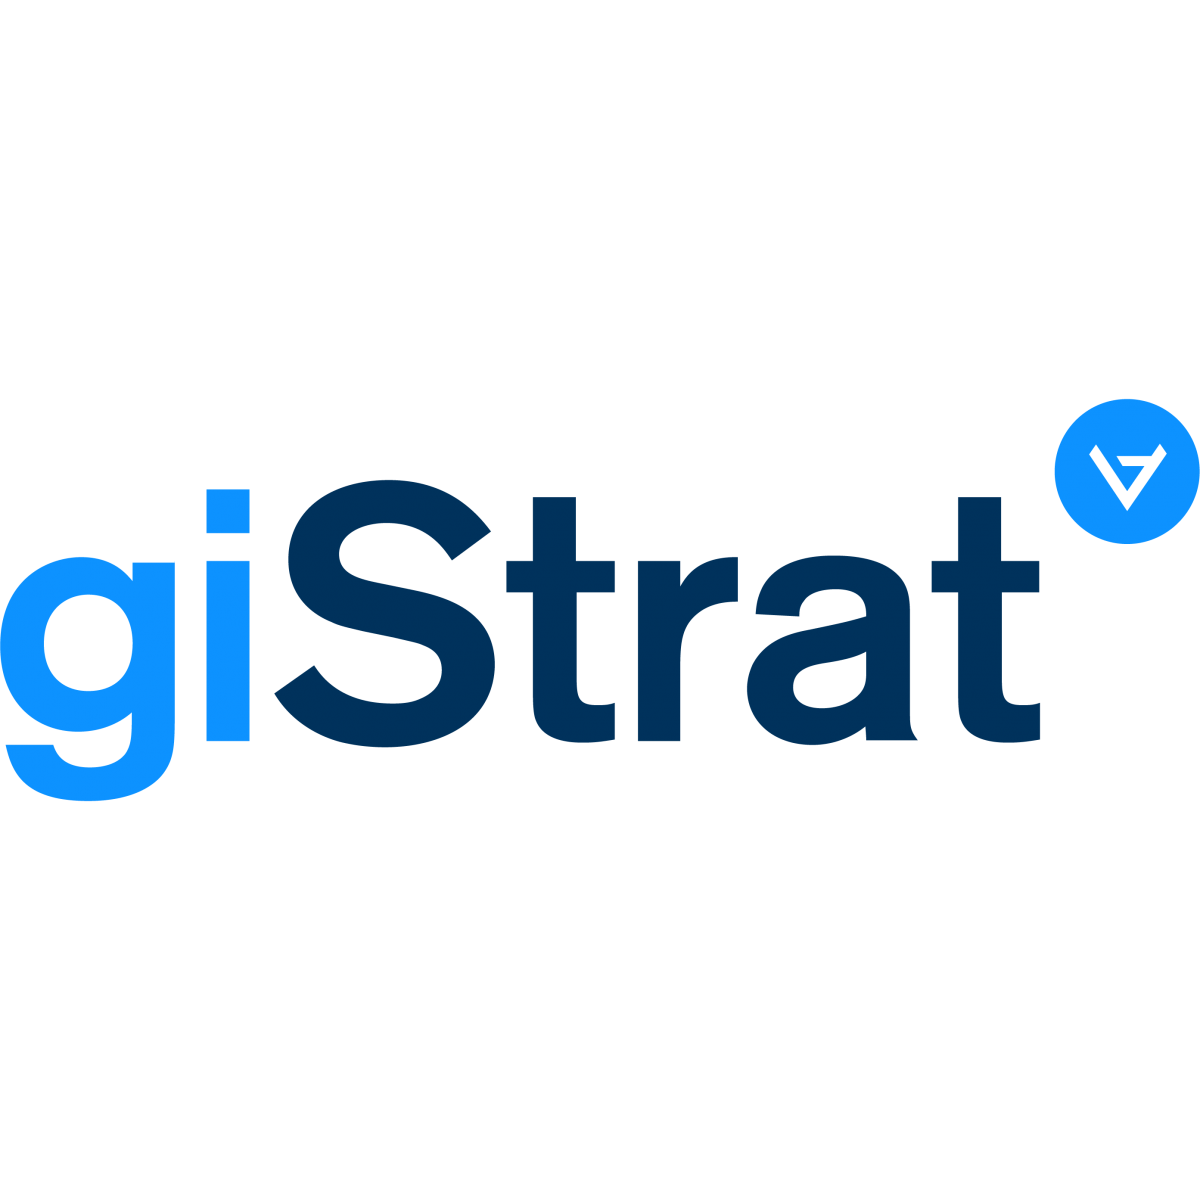 gistrat-sqlogo.png